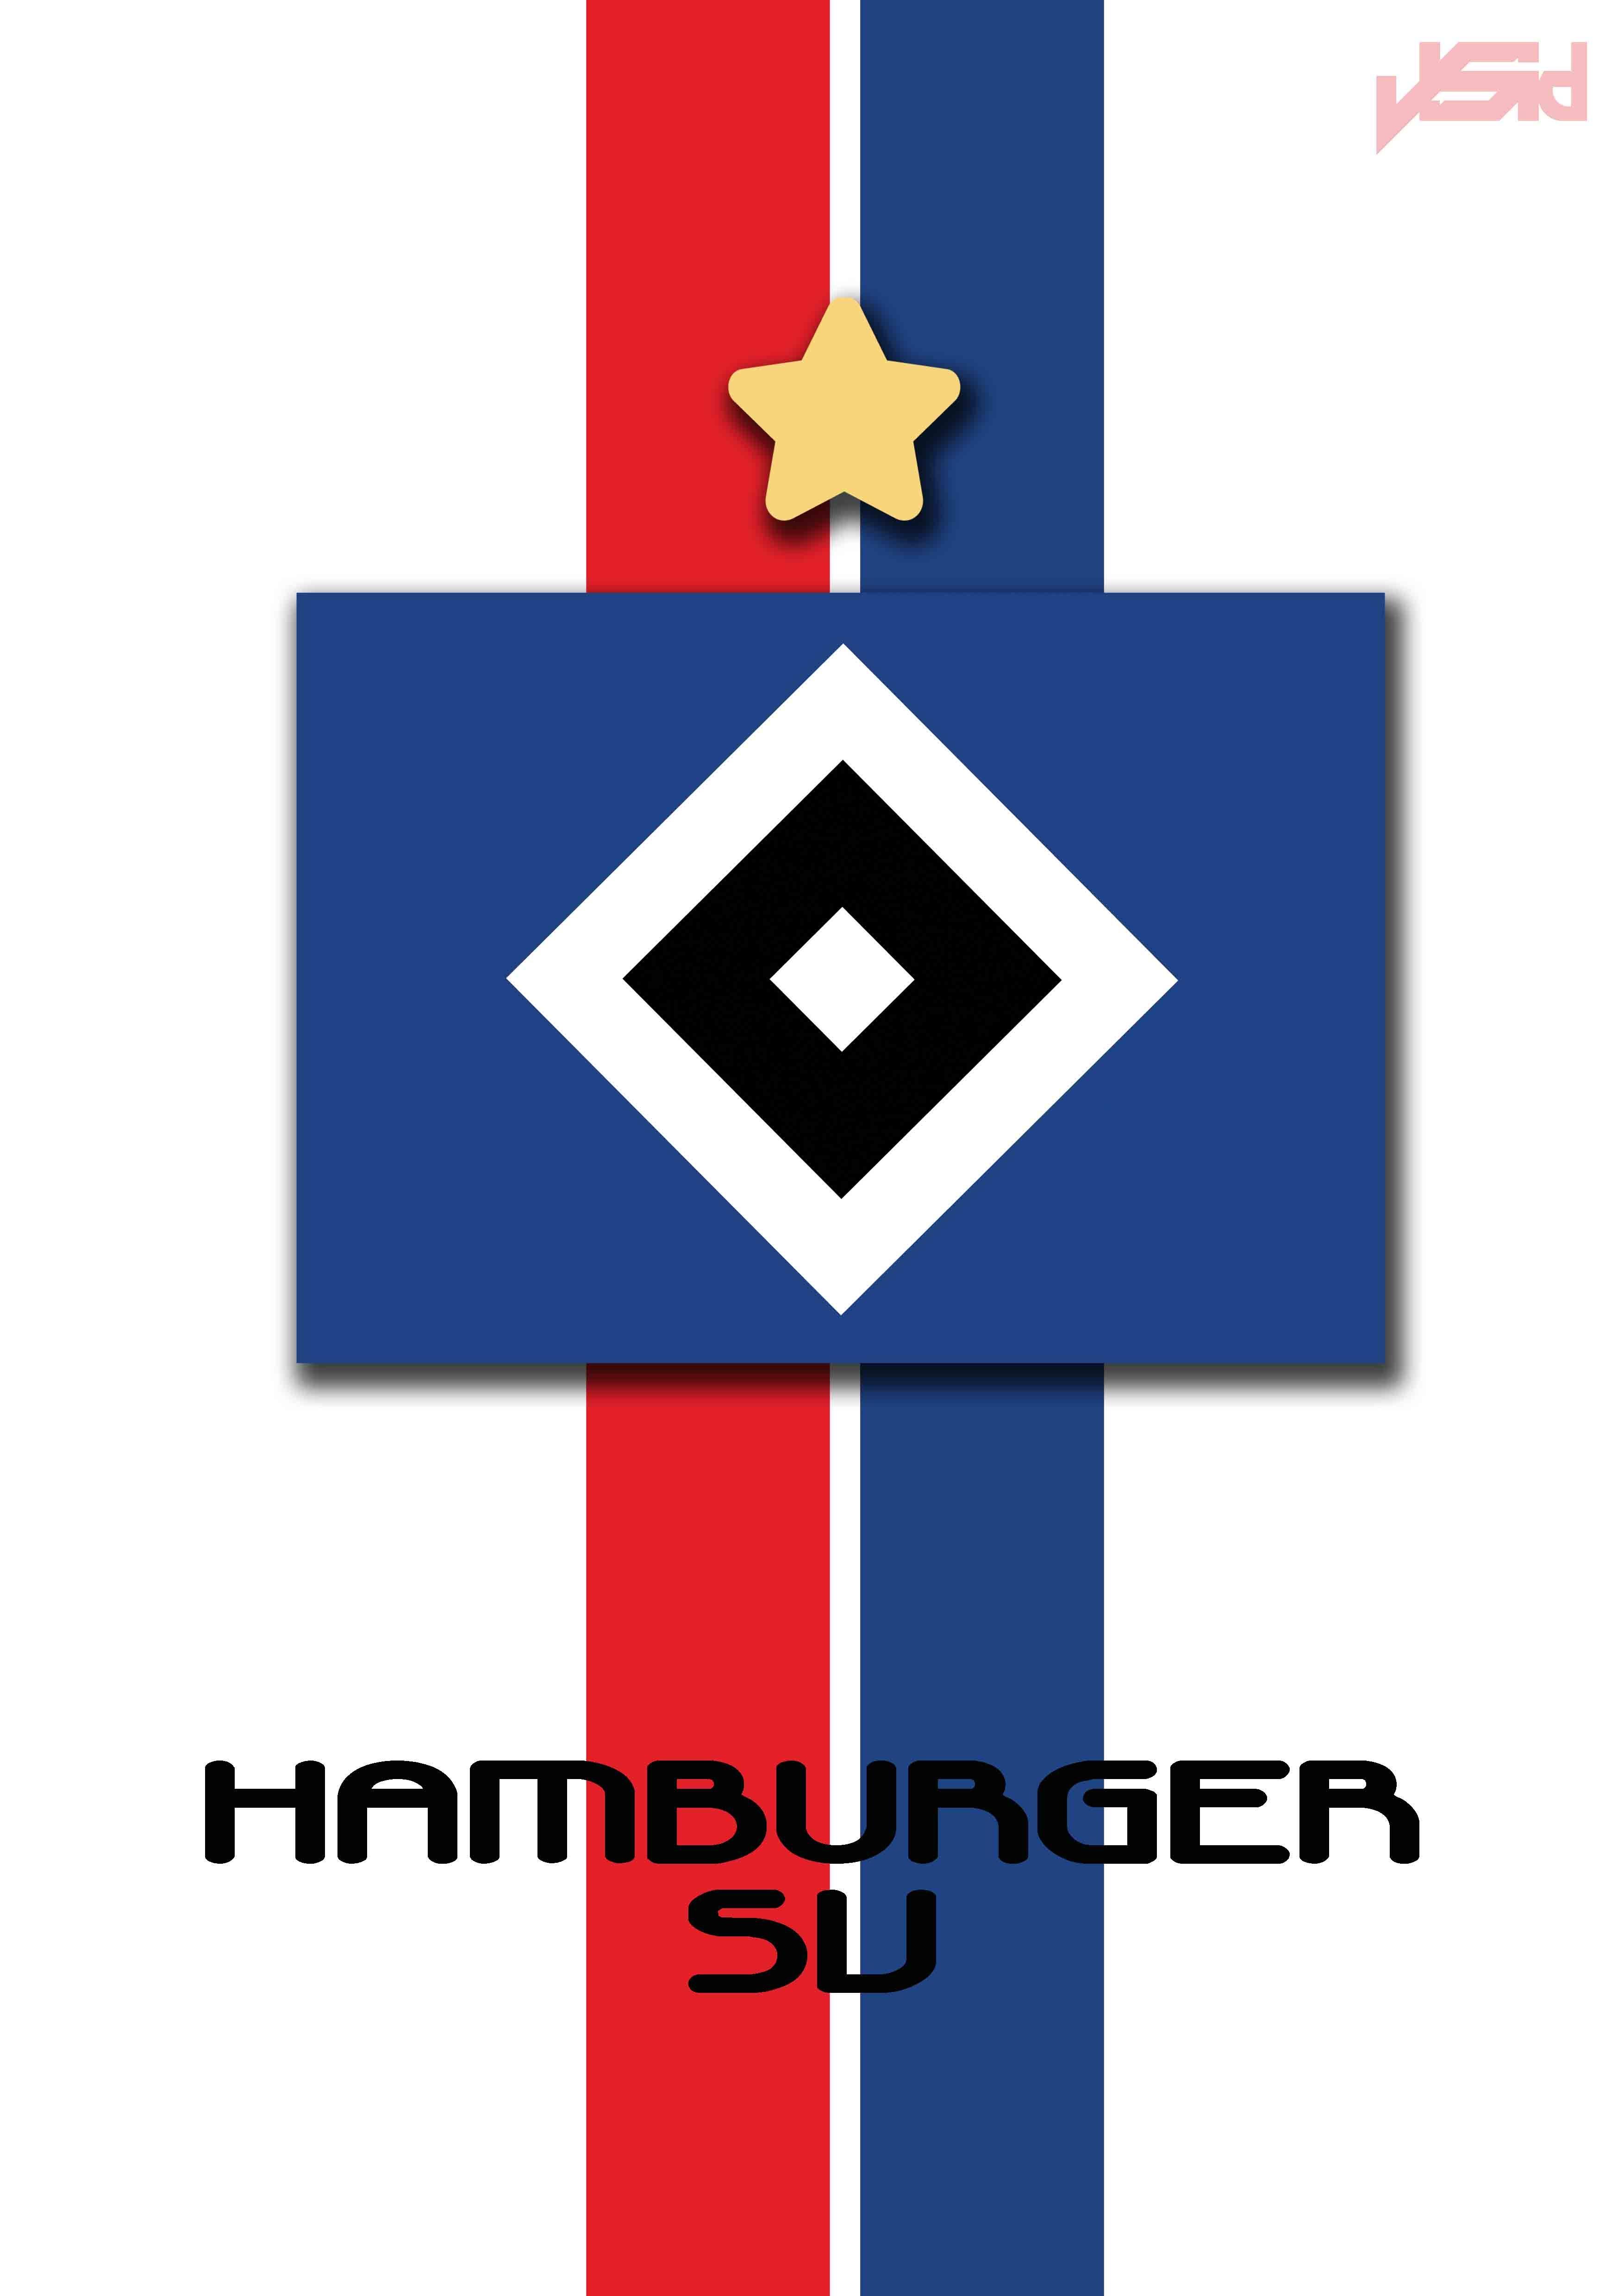 hamburger sv adidas